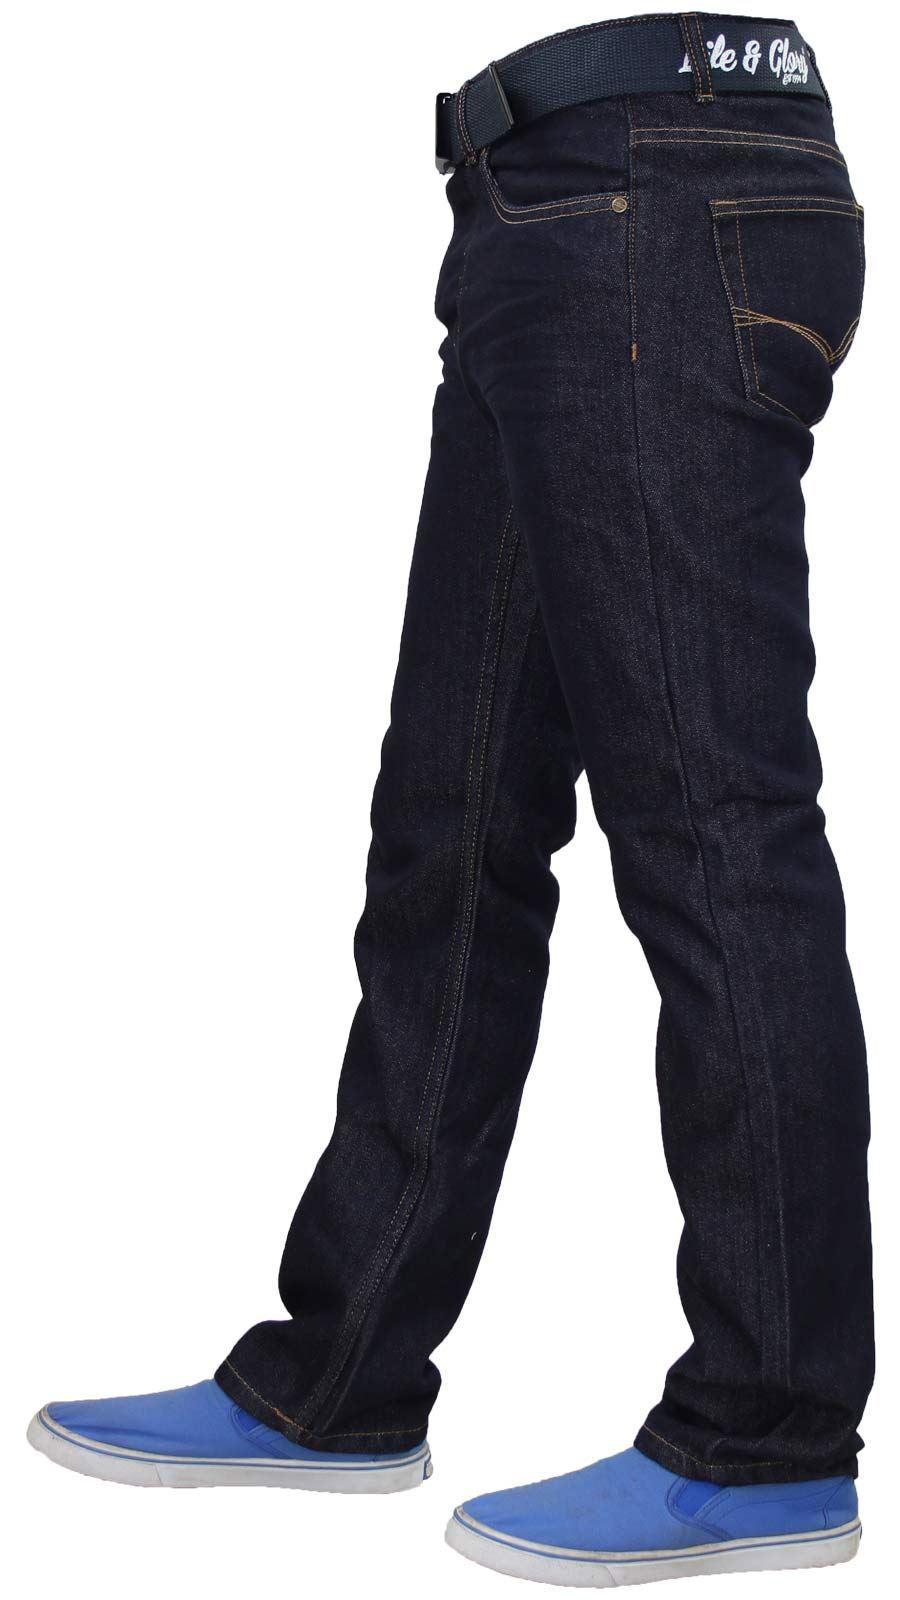 Men-Regular-Fit-Jeans-Denim-Button-Fly-Straight-Leg-Trouser-Pant-With-Free-Belt thumbnail 15